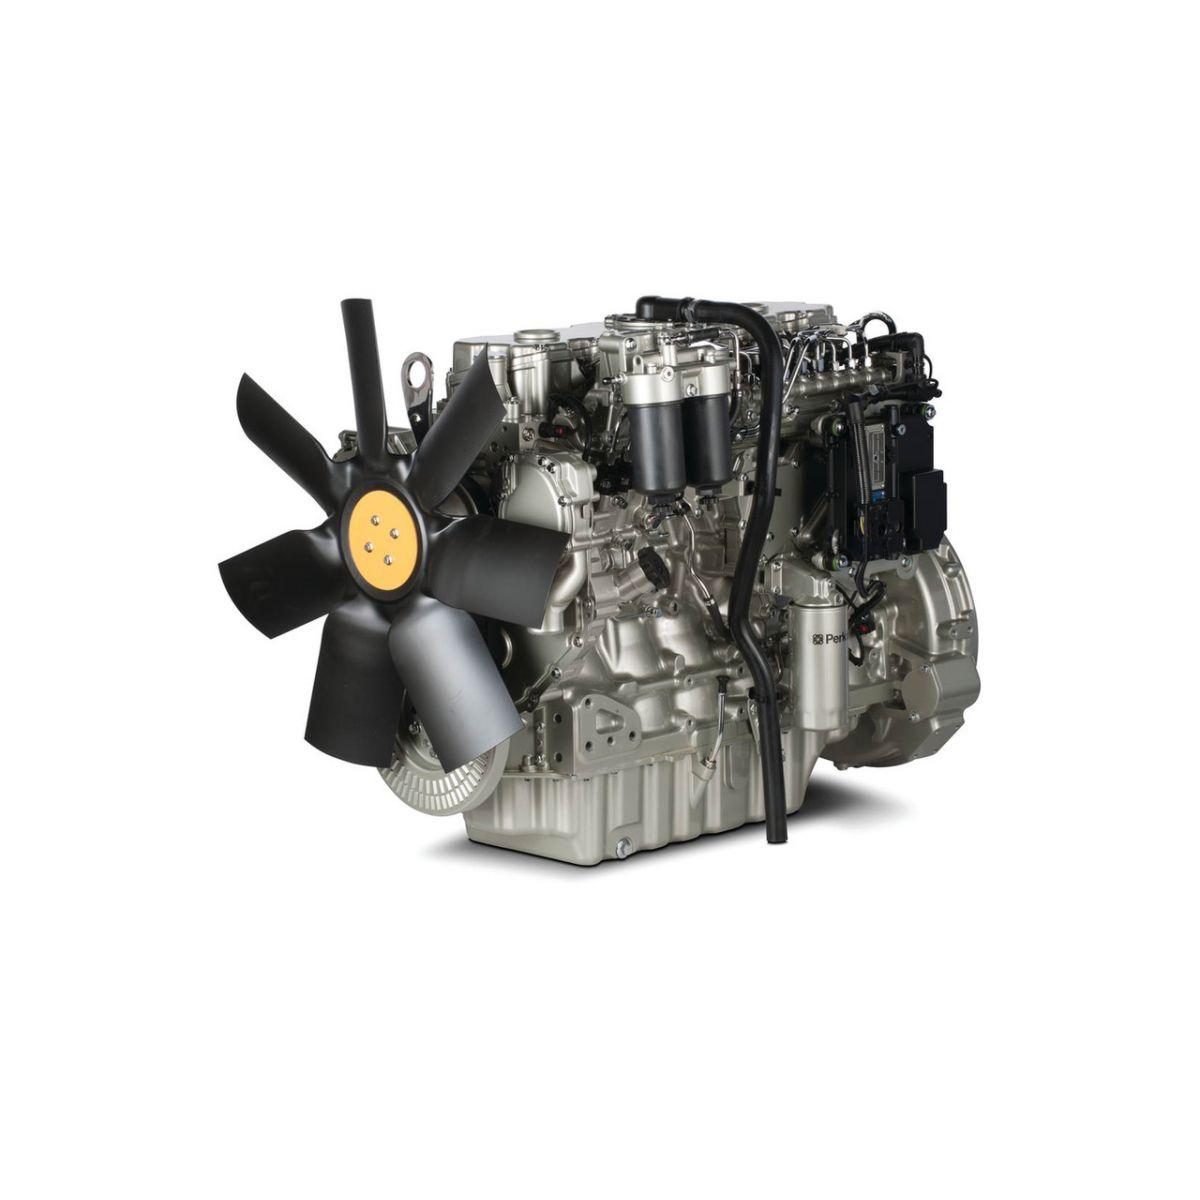 Motor Perkins 1106